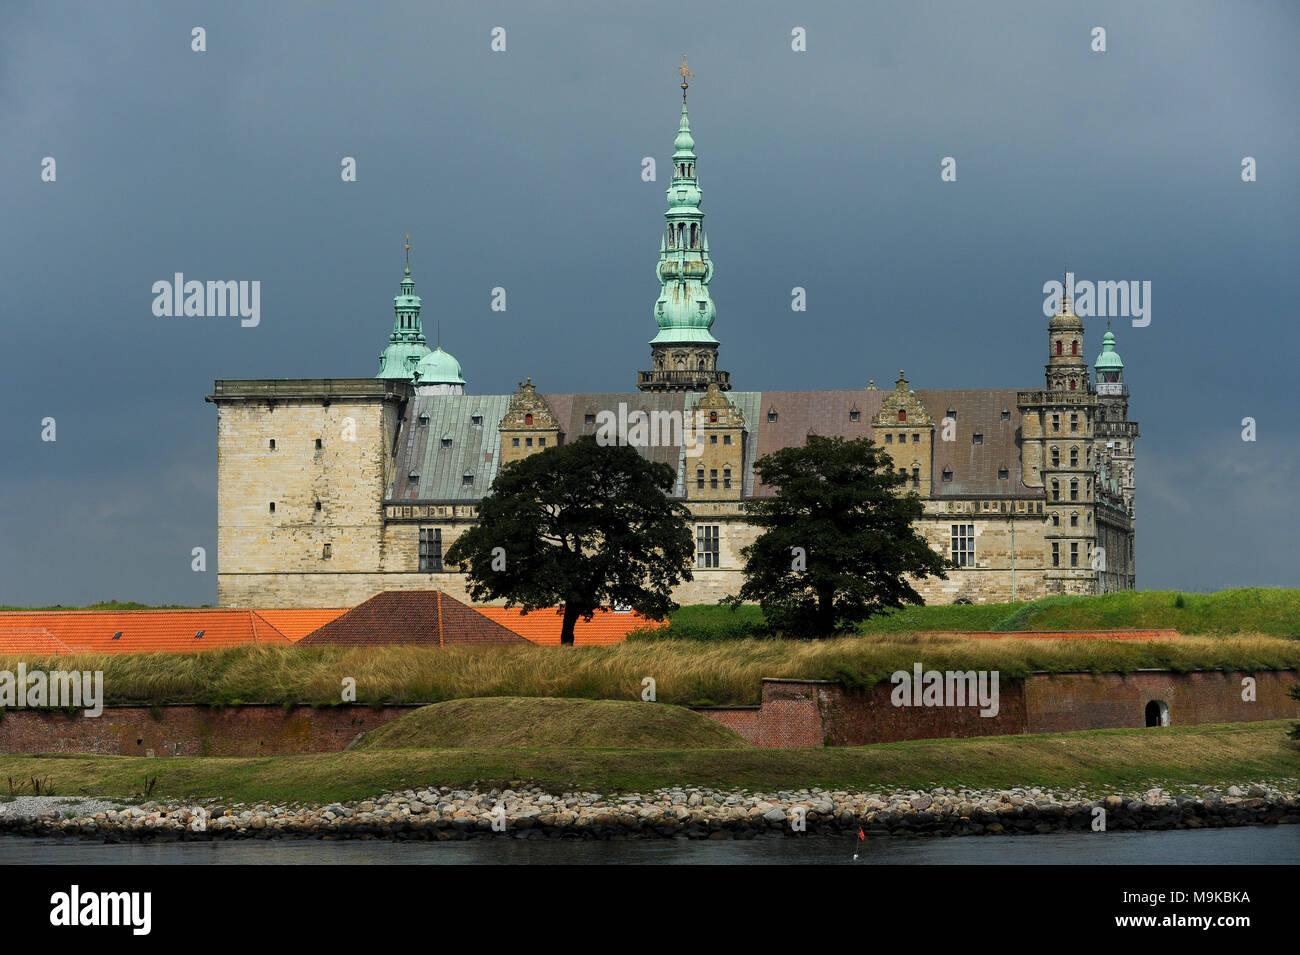 Royal Palace of Kronborg in Helsingor, Capital Region of Denmark, Denmark. August 15th 2010, built in XV century as Krogen fortress by king Eric of Po - Stock Image